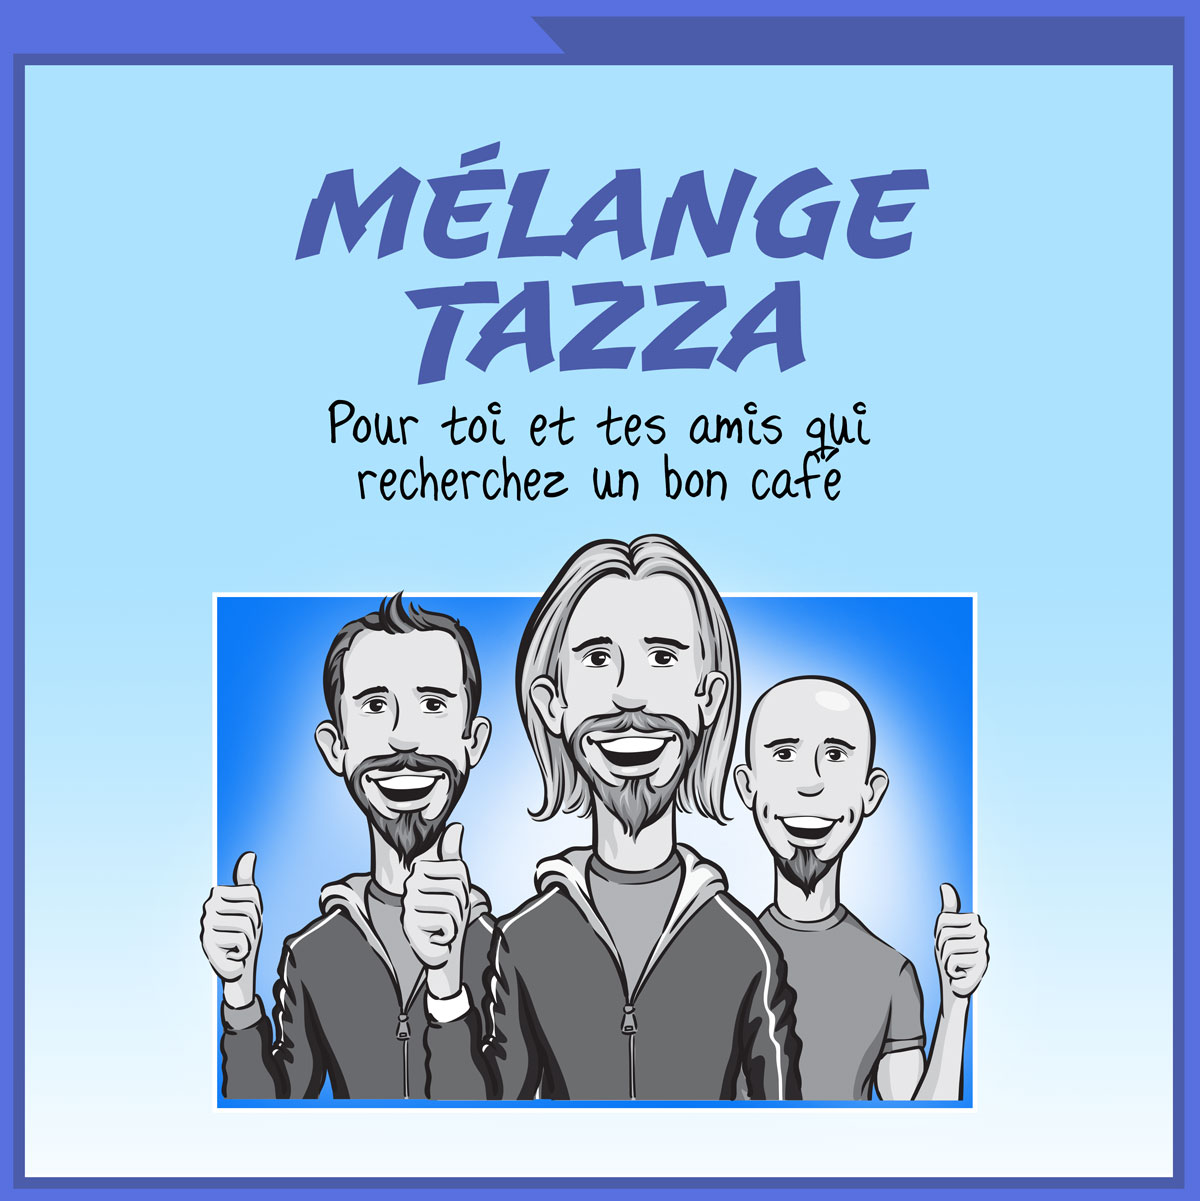 Mélange Tazza